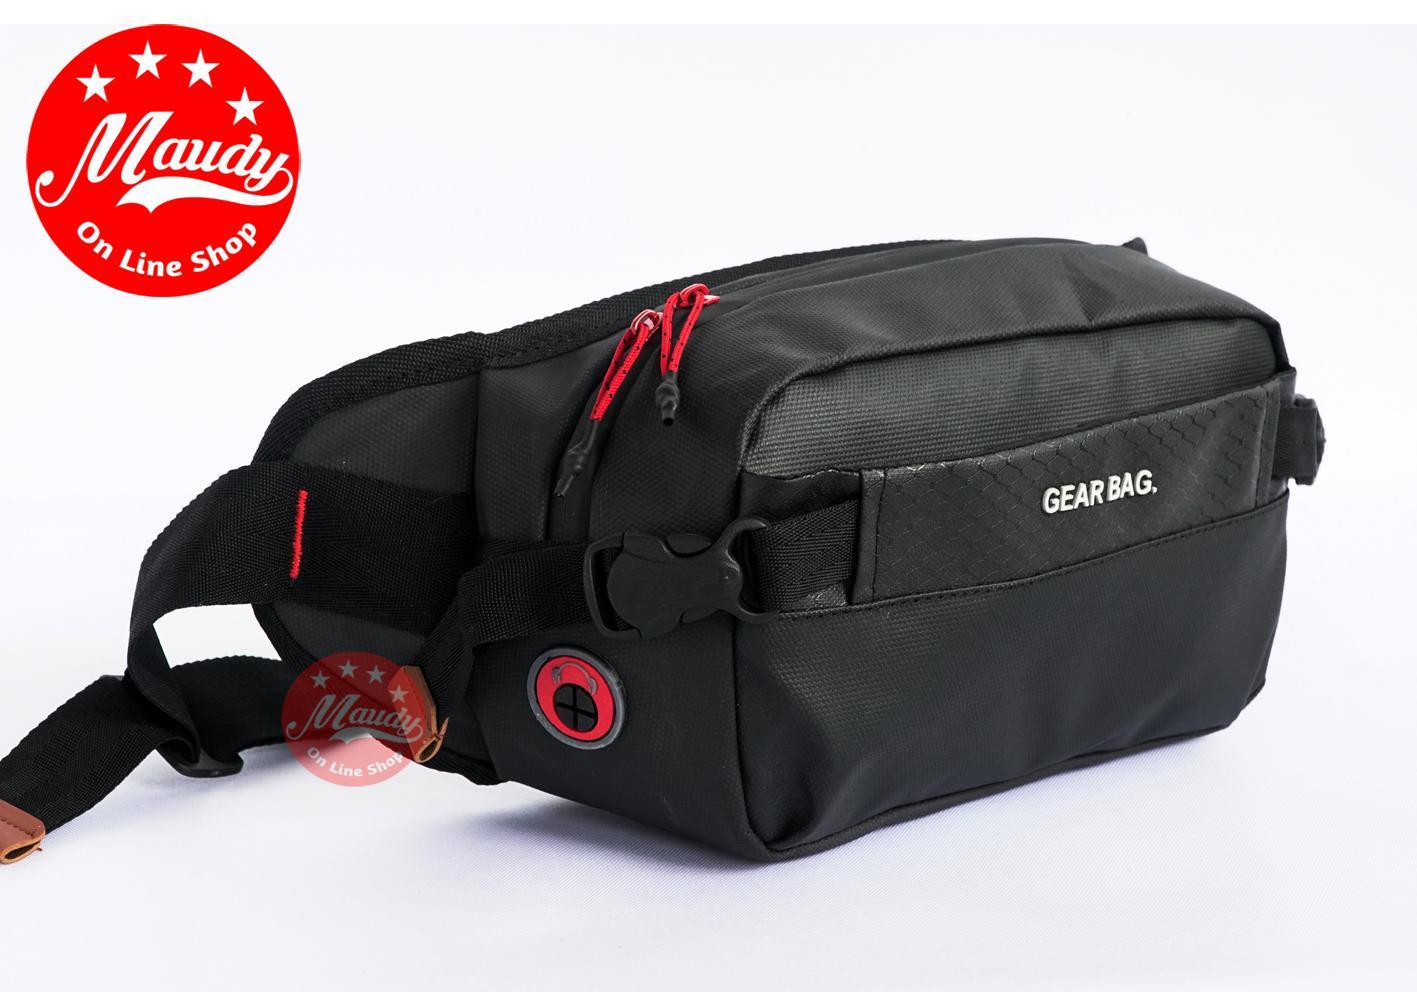 waist bag gear bag hard deck 12 – sling bag cowok – waist bag laki laki – tas selempang – tas pinggang